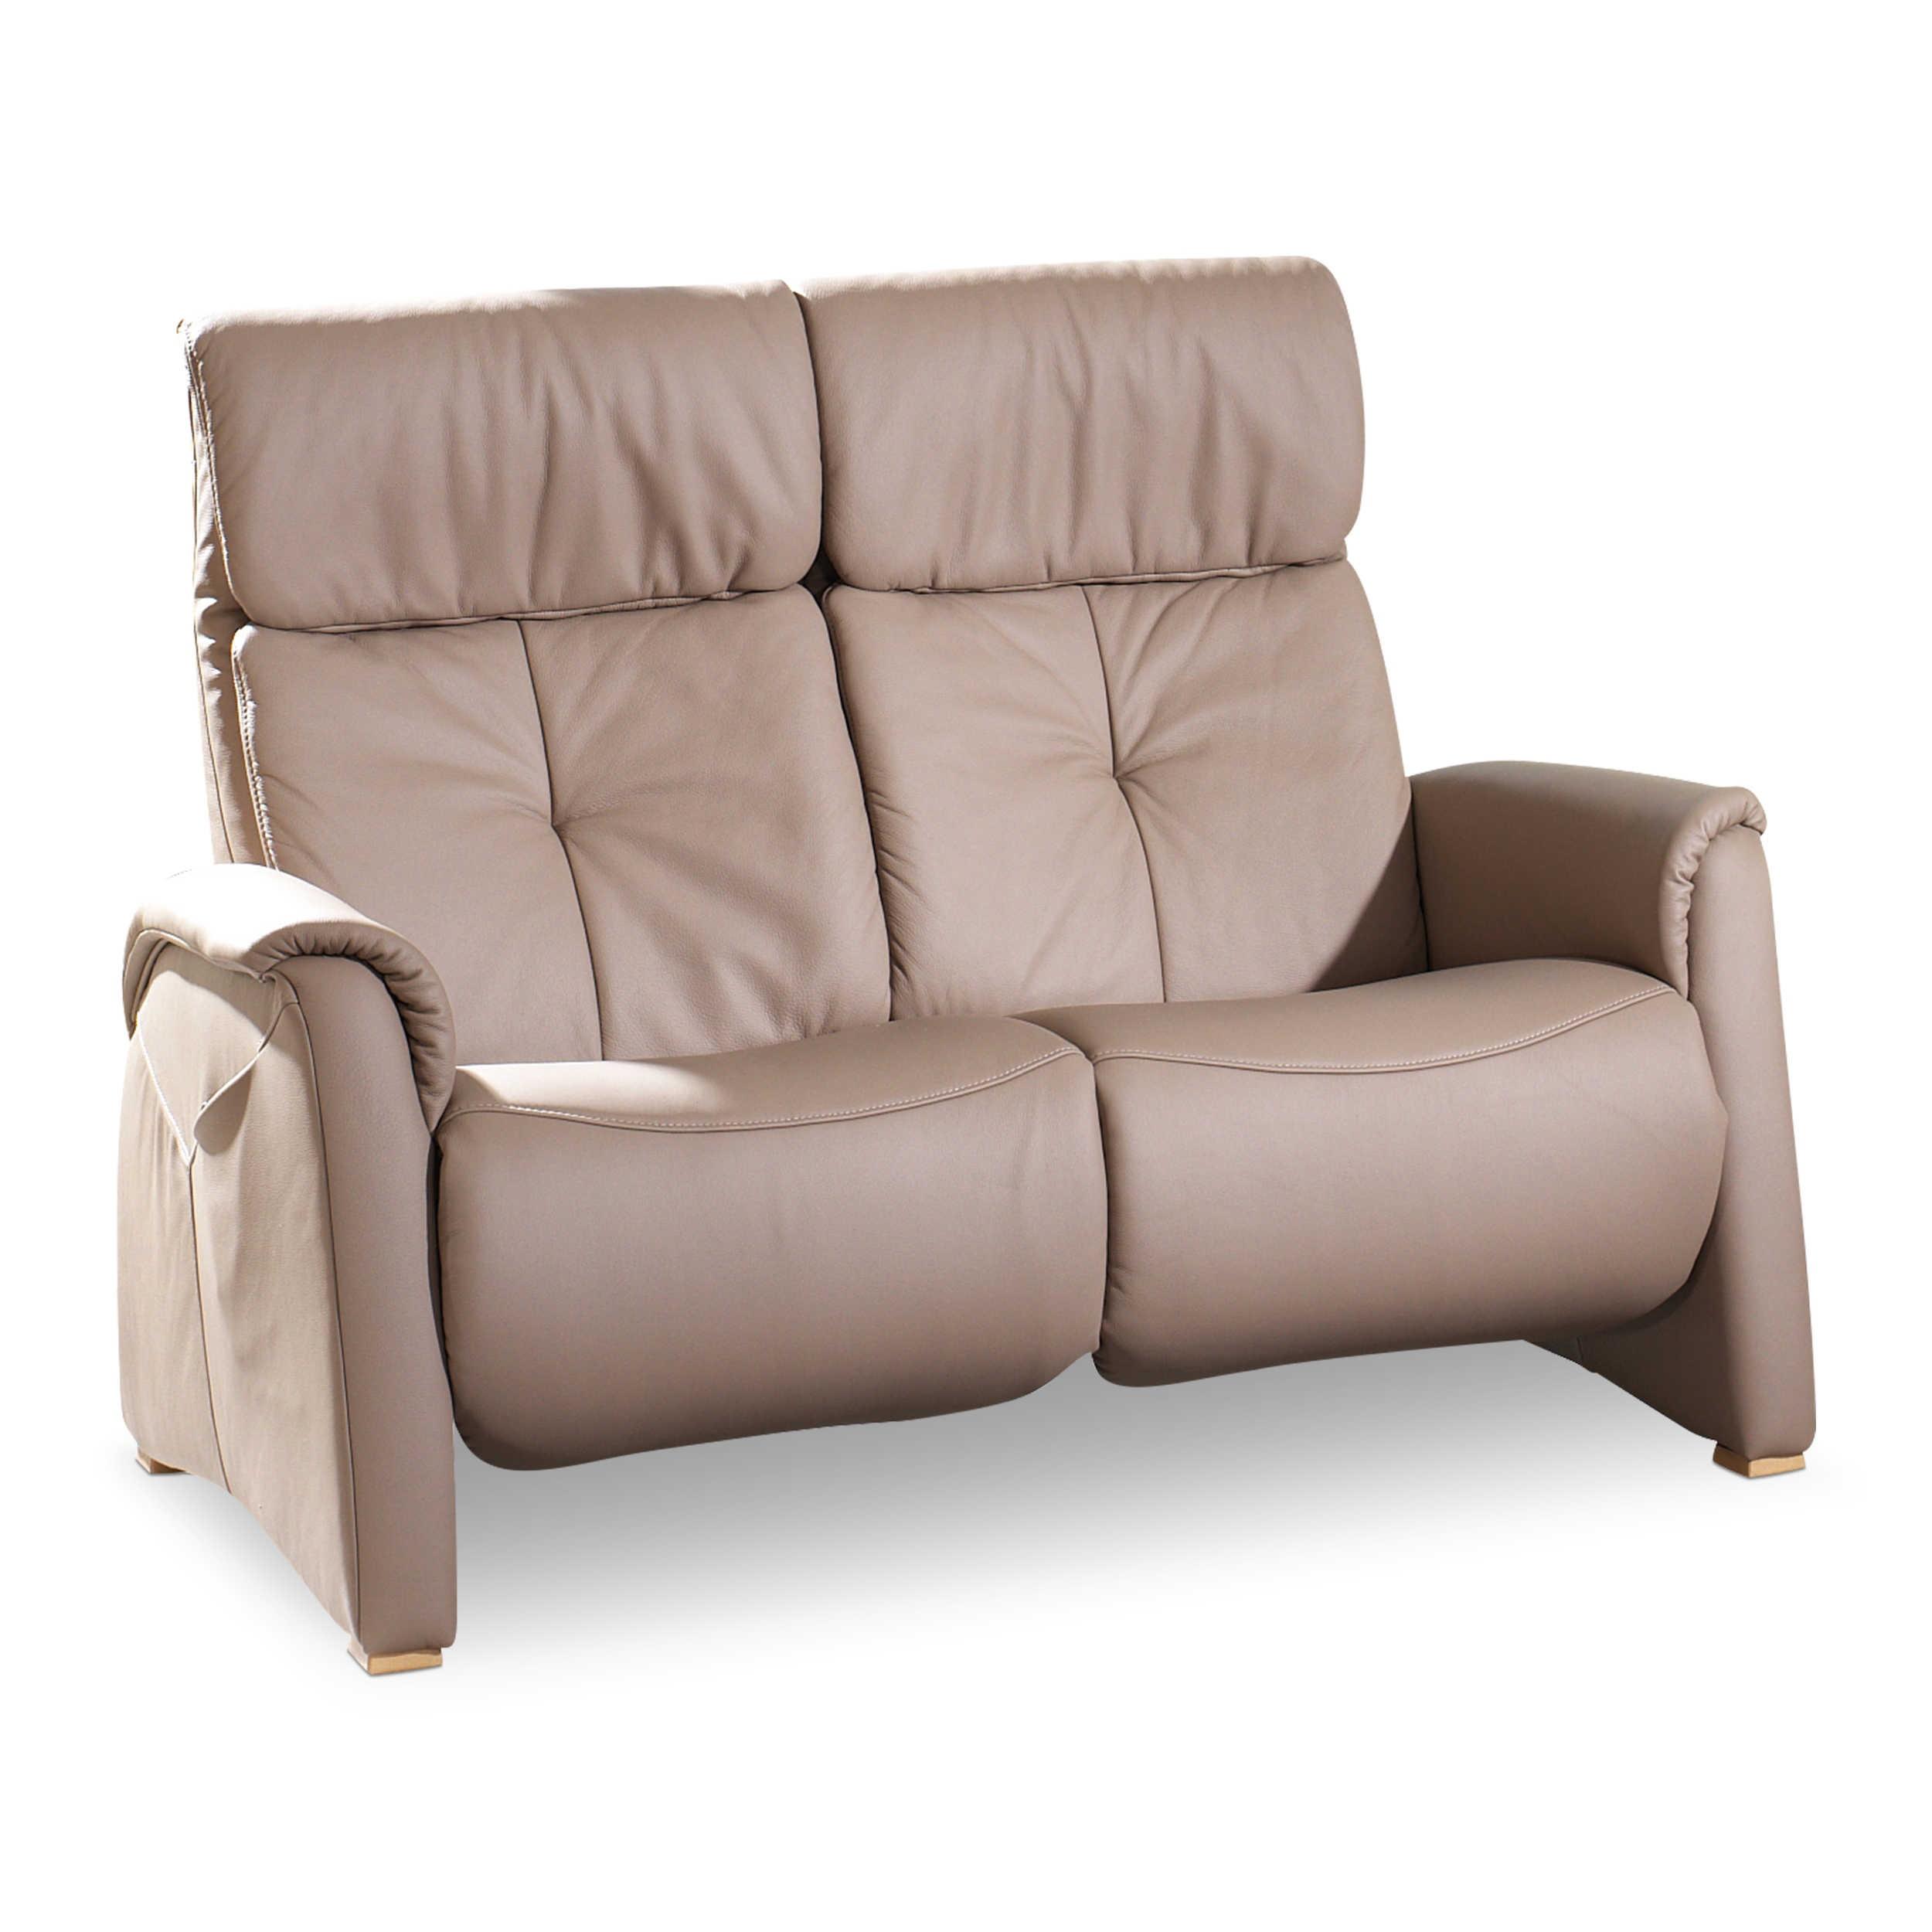 himolla sofa rosenheim beige leder online kaufen bei woonio. Black Bedroom Furniture Sets. Home Design Ideas